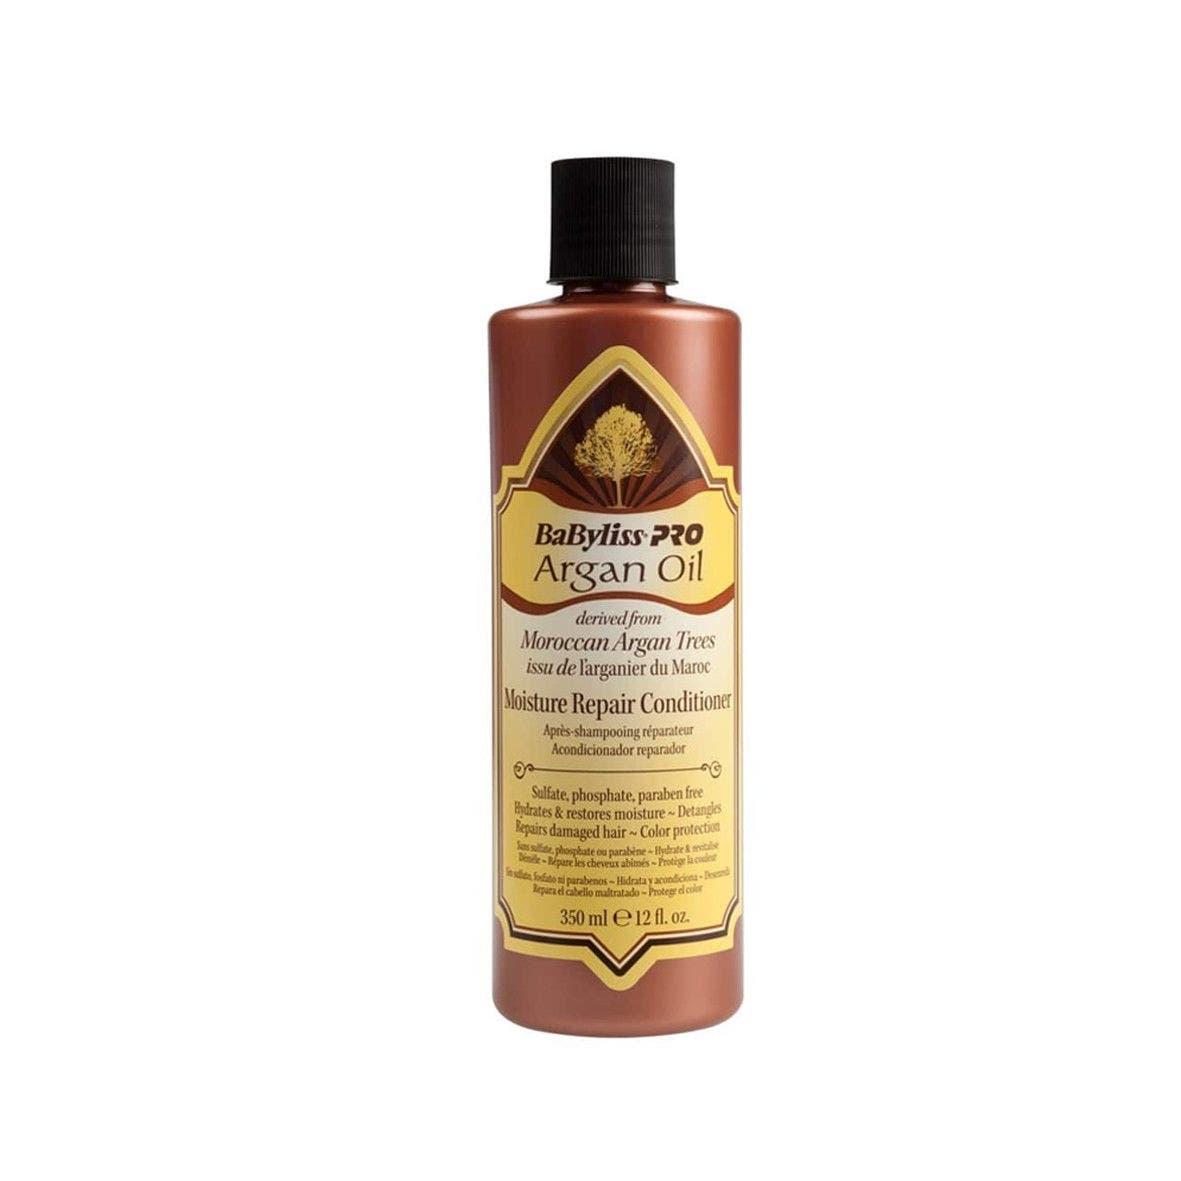 Babyliss Pro Argan Oil Hydrate Repair Nourish Moisture Repair Conditioner 350ml Only